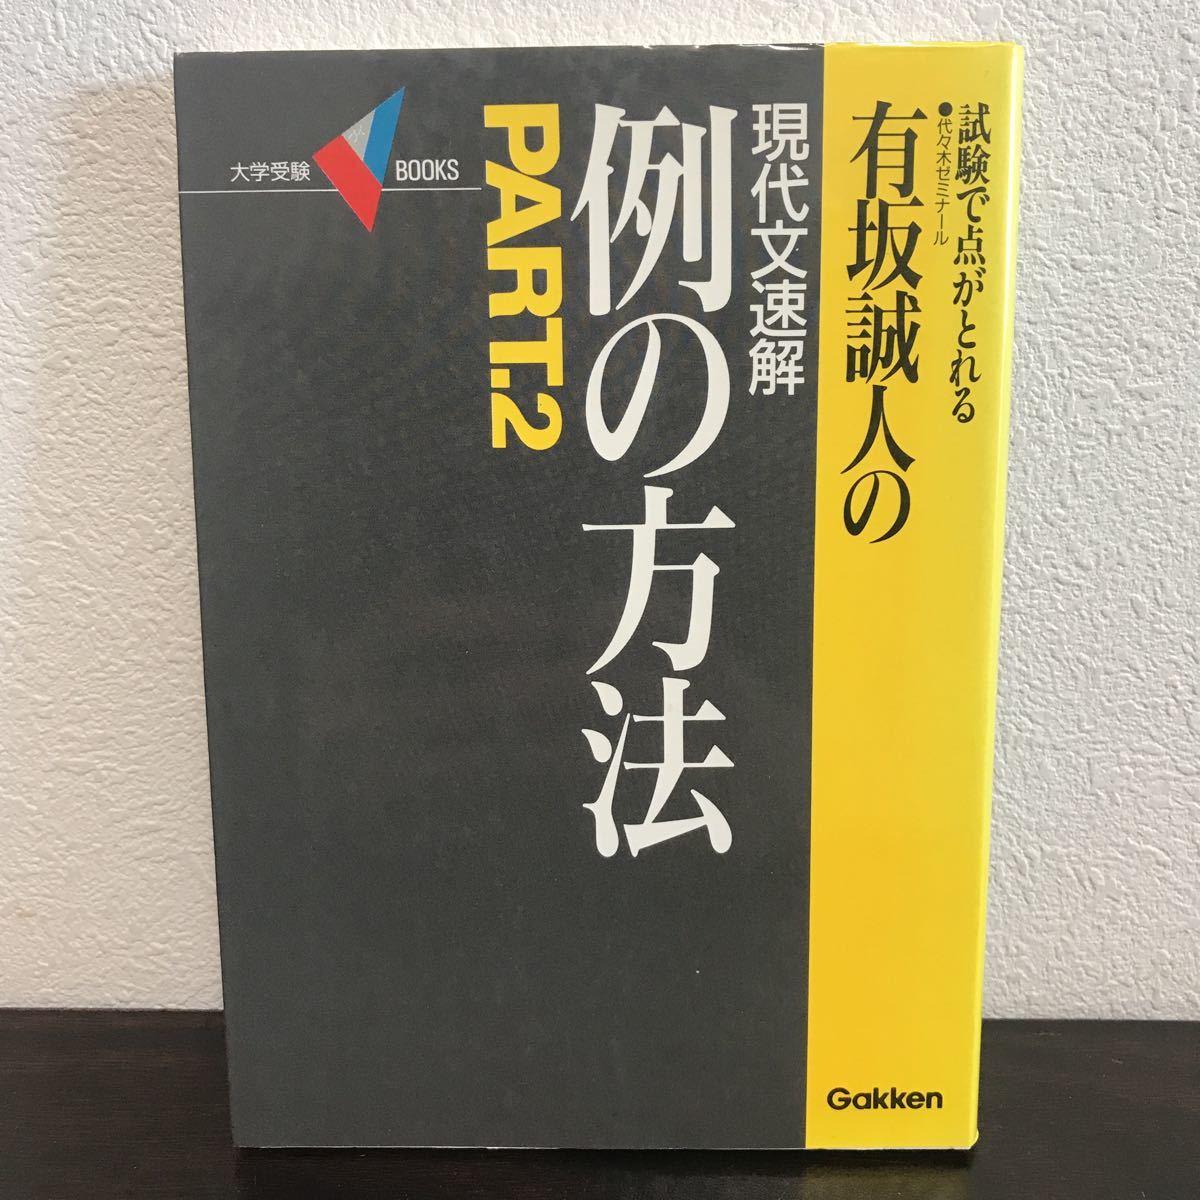 rb02▲有坂誠人の 現代文速解 例の方法 PART.2 試験で点がとれる 学研 大学受験